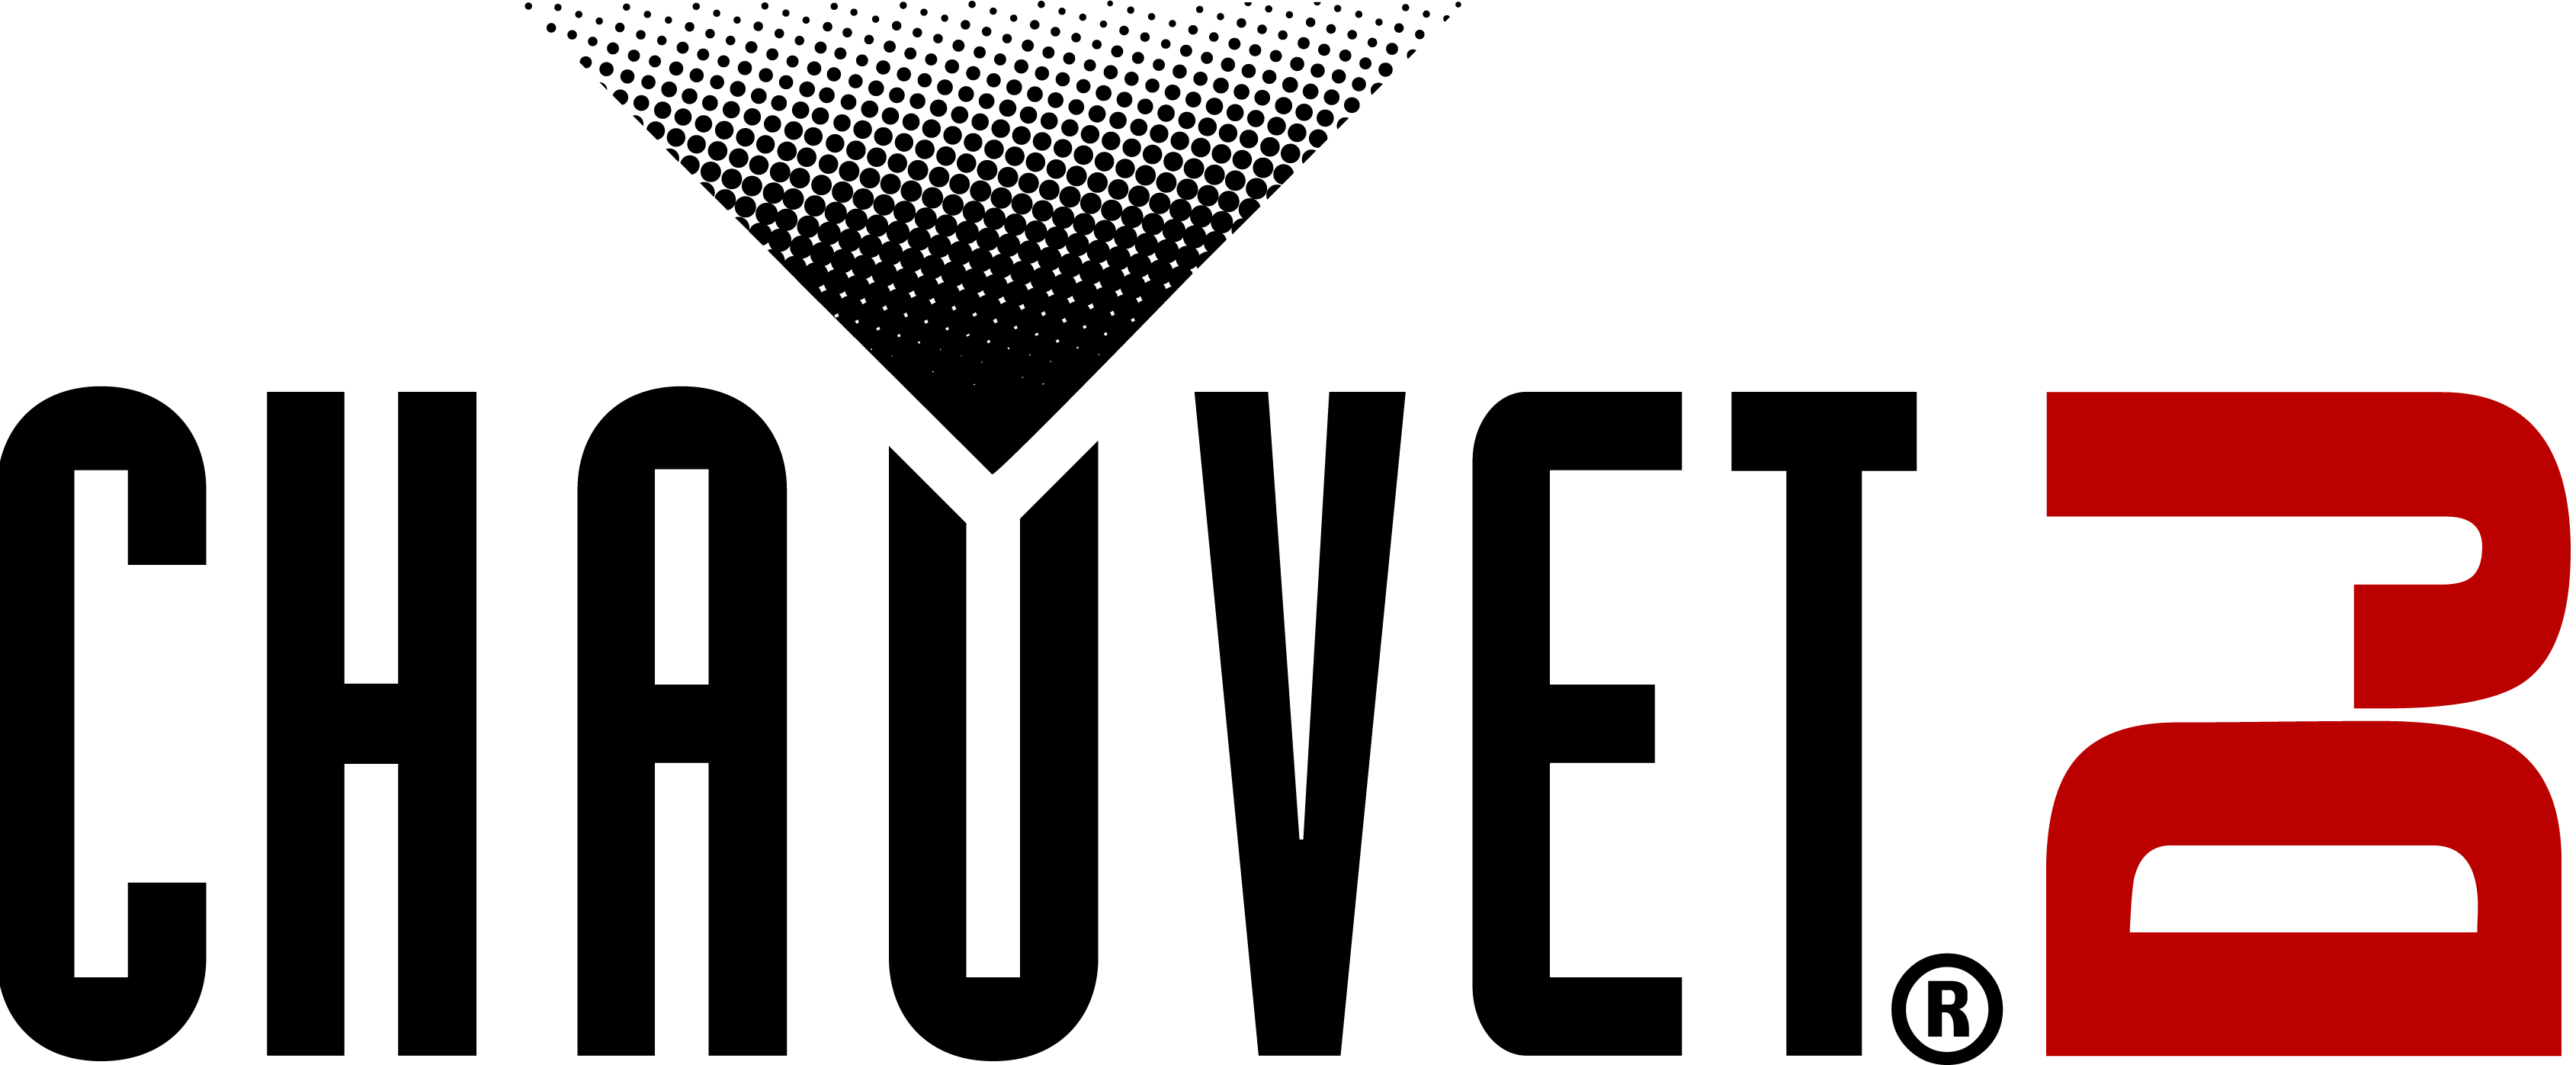 chauvet-logo-dj-red-version